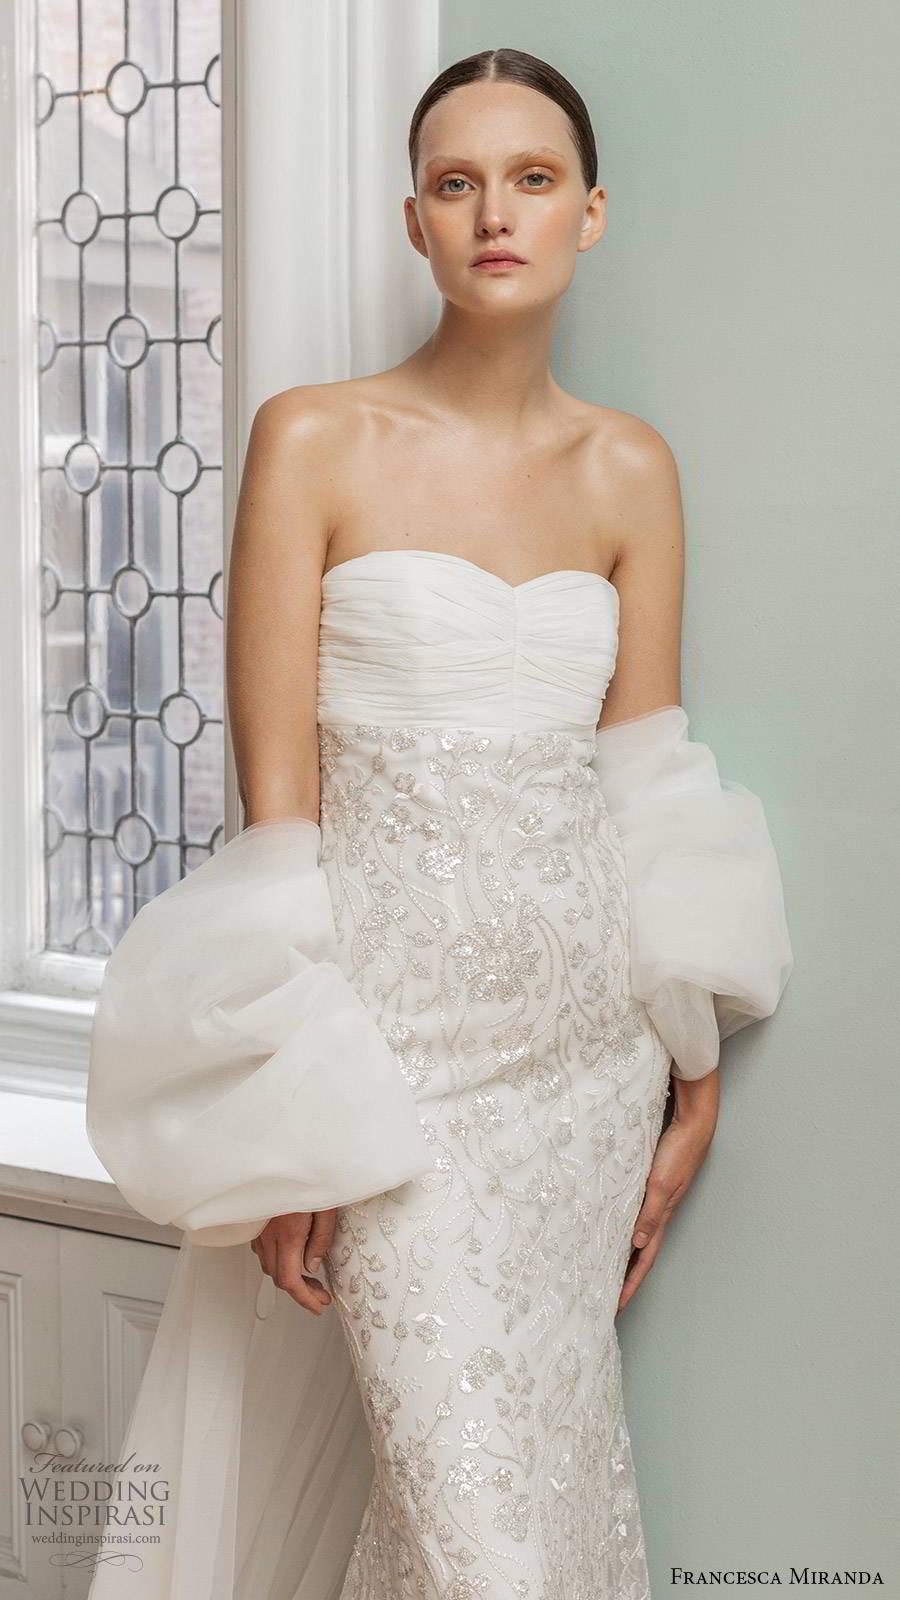 francesca miranda spring 2020 bridal strapless semi sweetheart neckling ruched bodice embellished skirt sheath wedding dress modern glam glitzy chapel train (8) zv